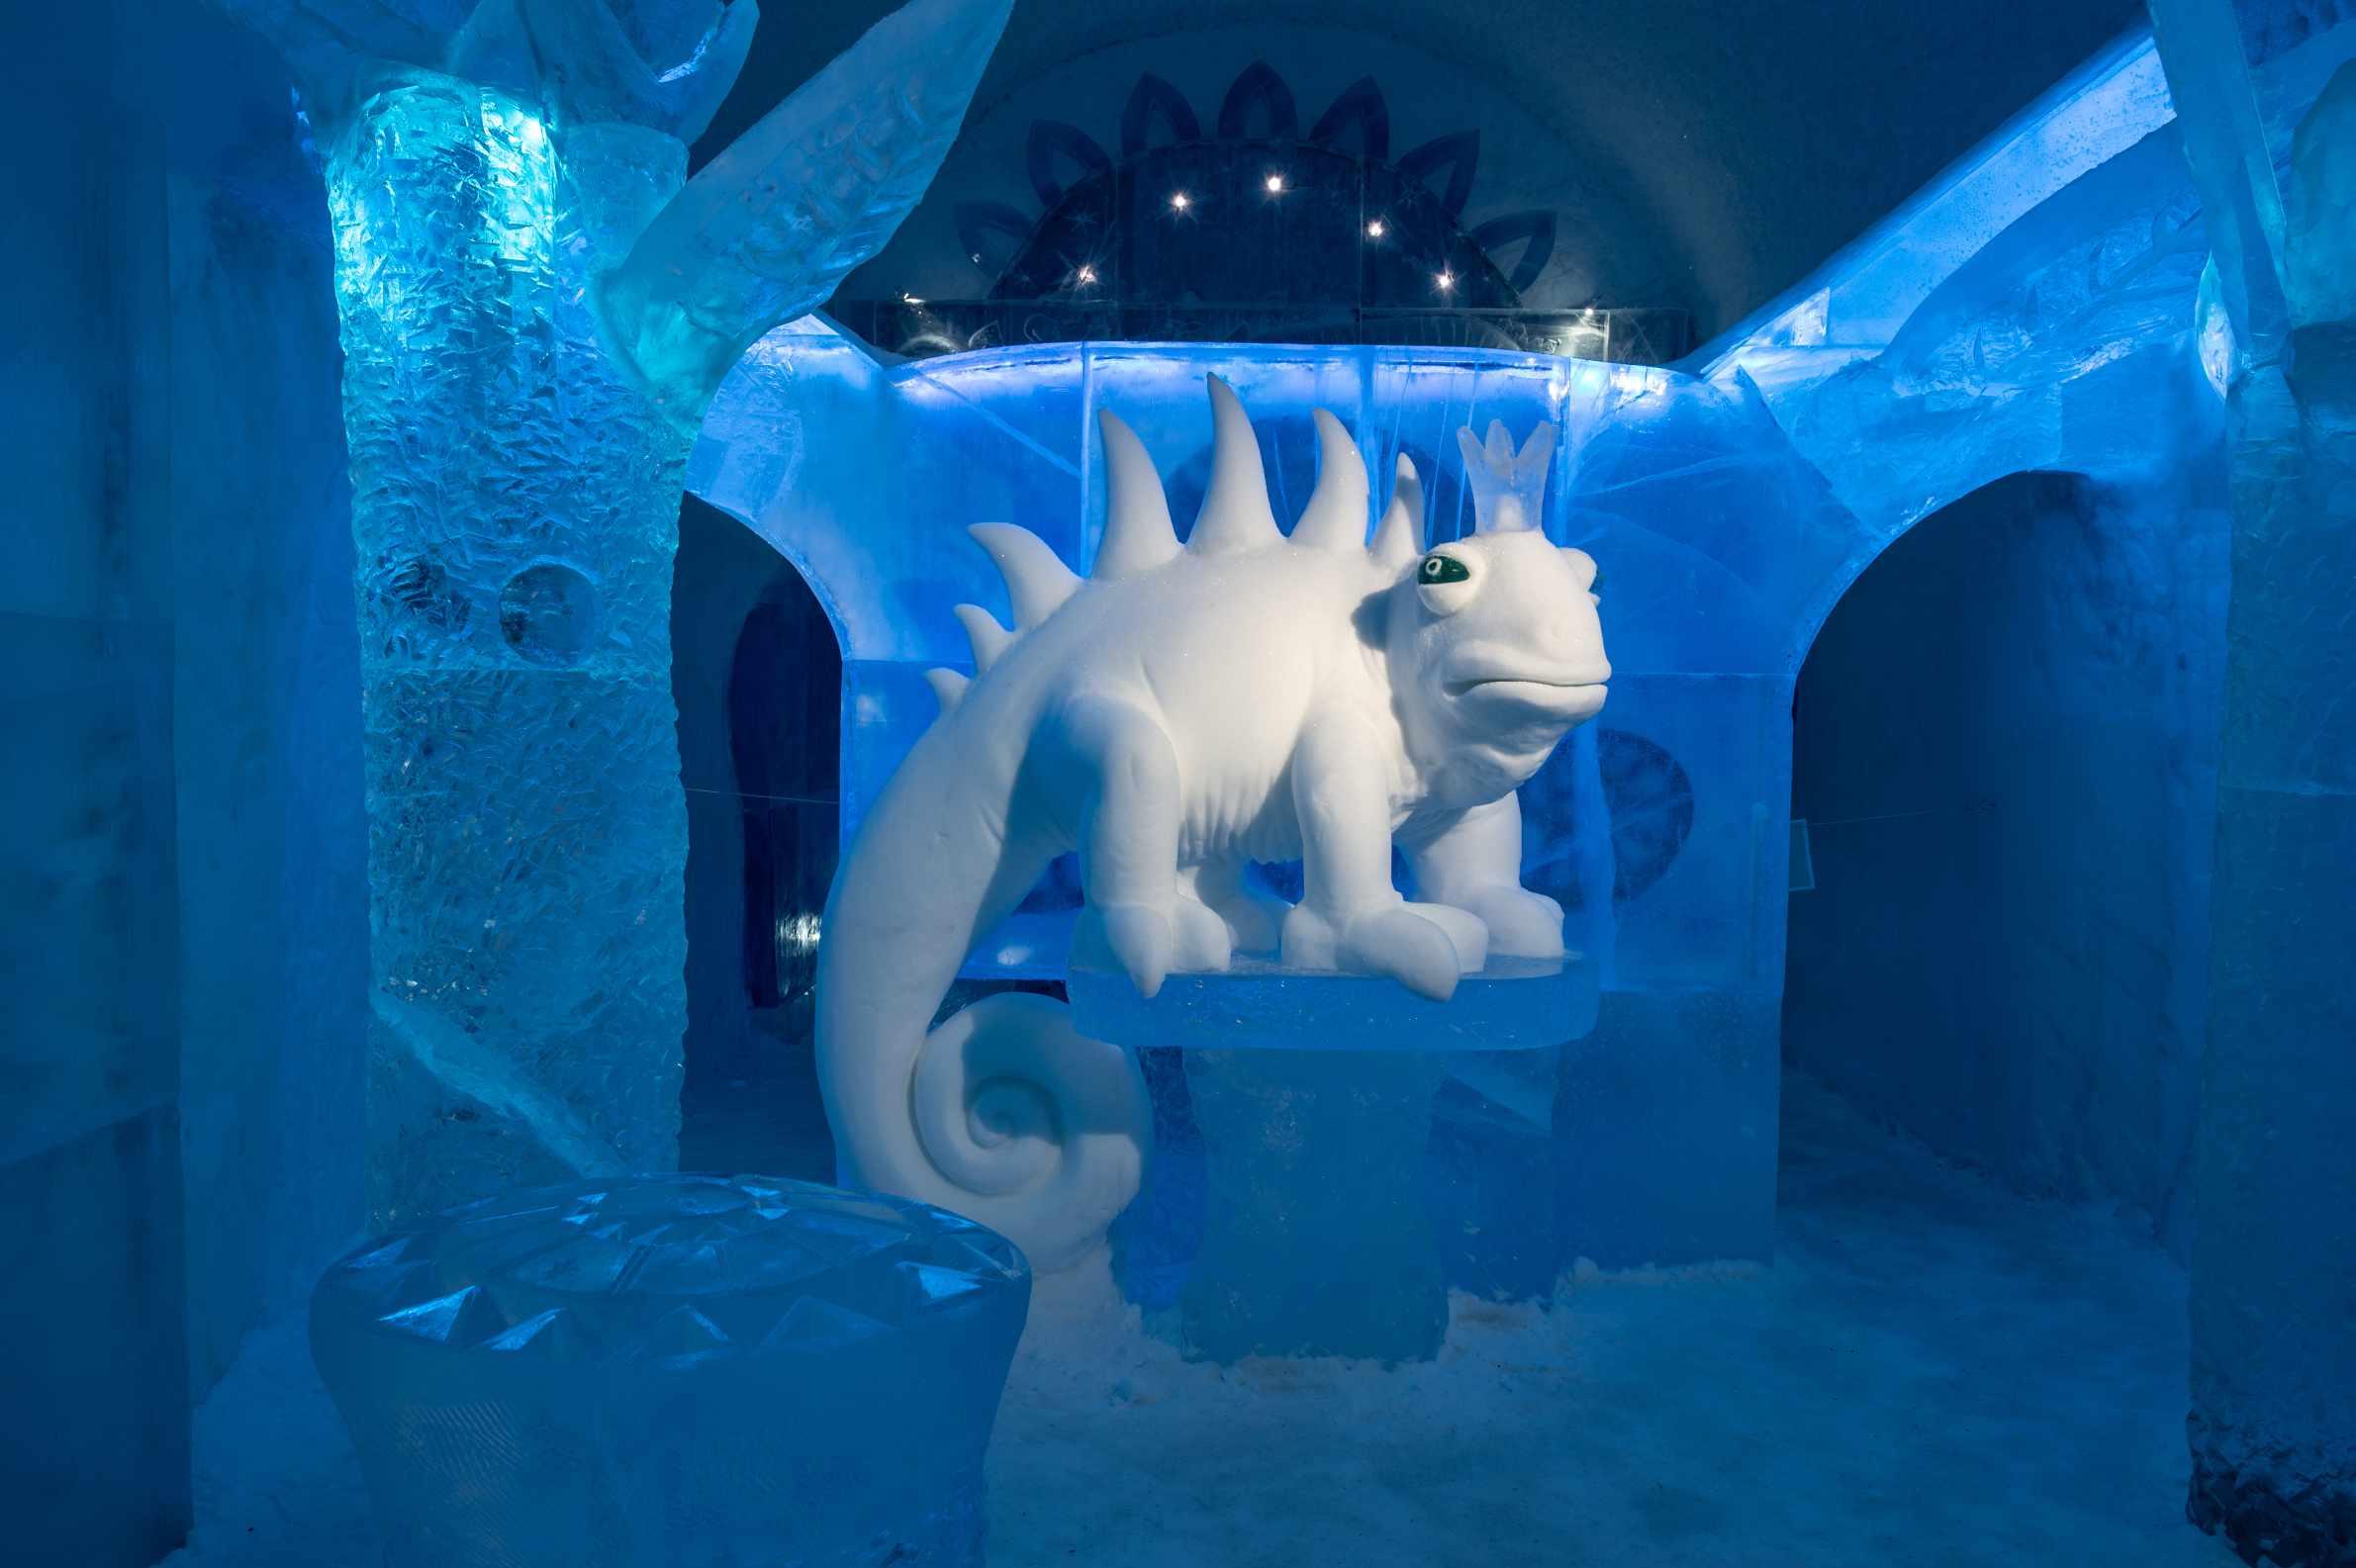 chameleon snow sculpture